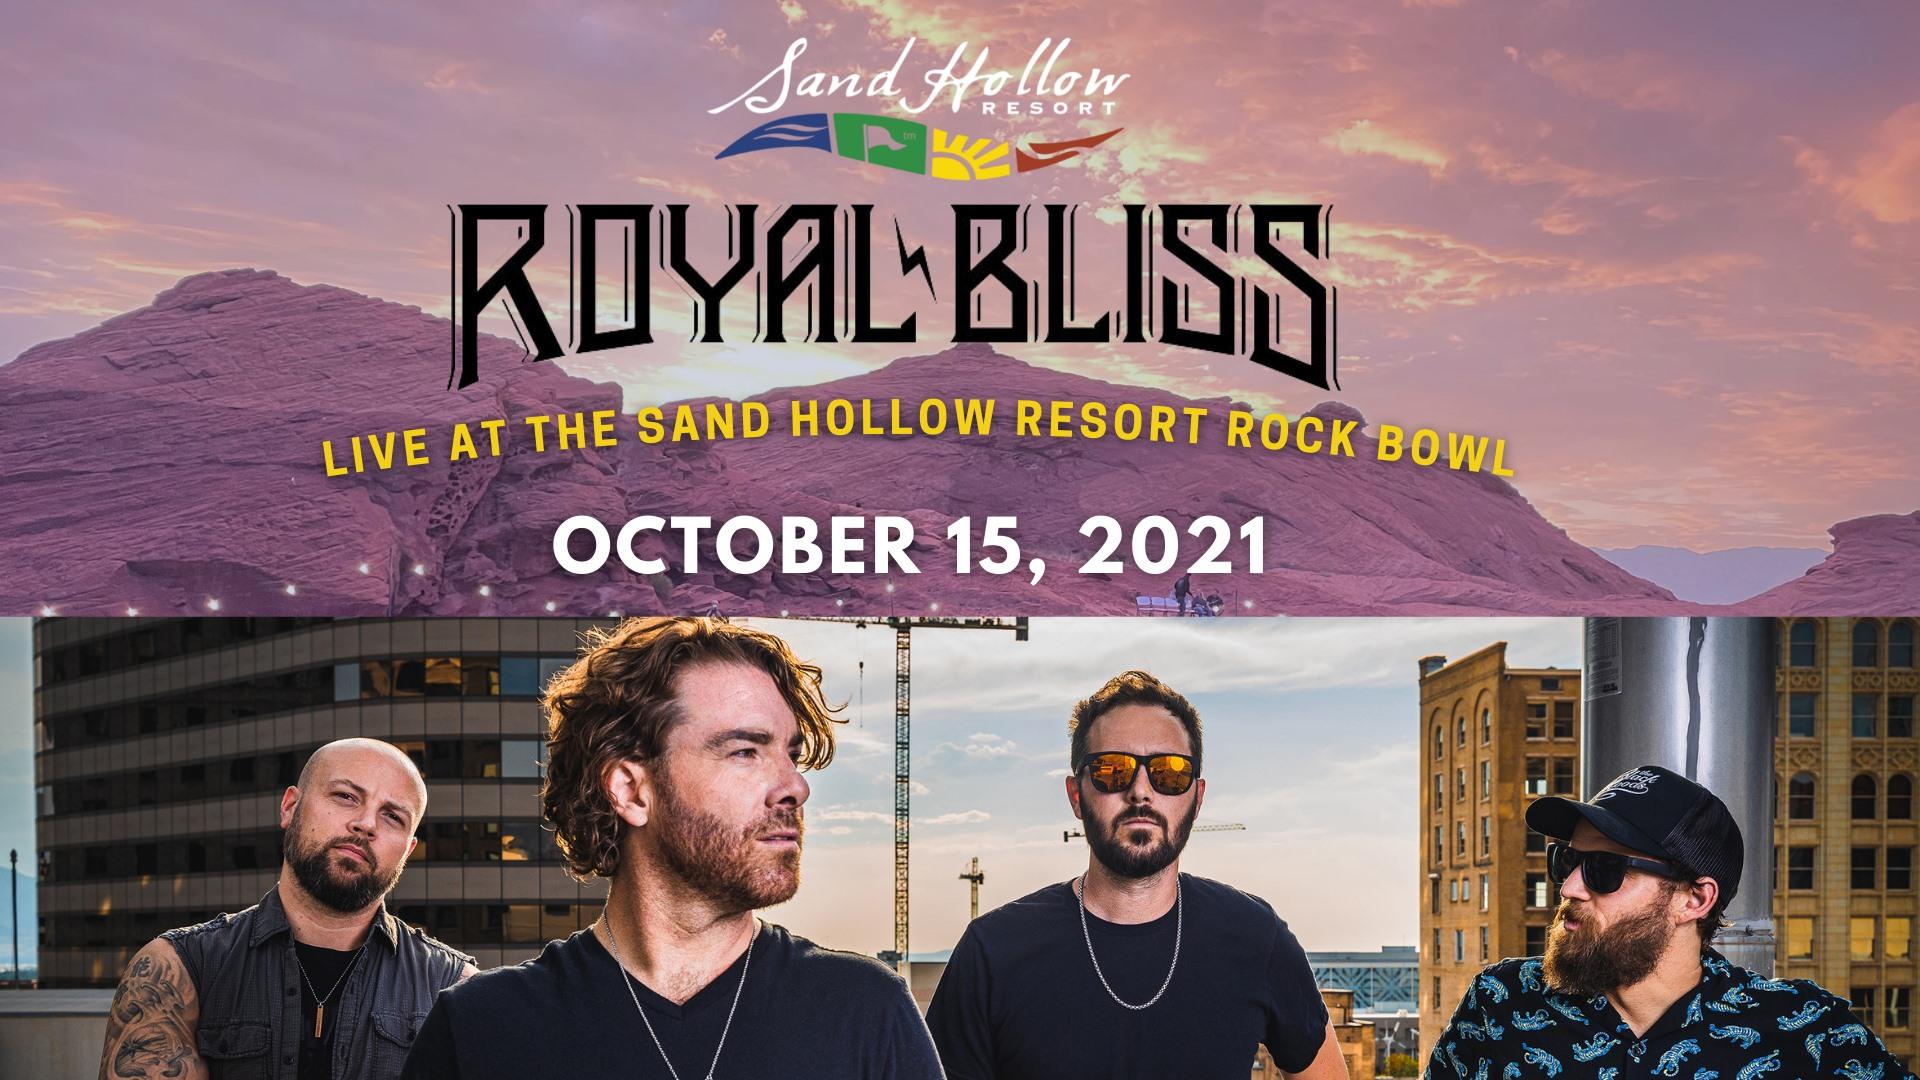 royal bliss concert